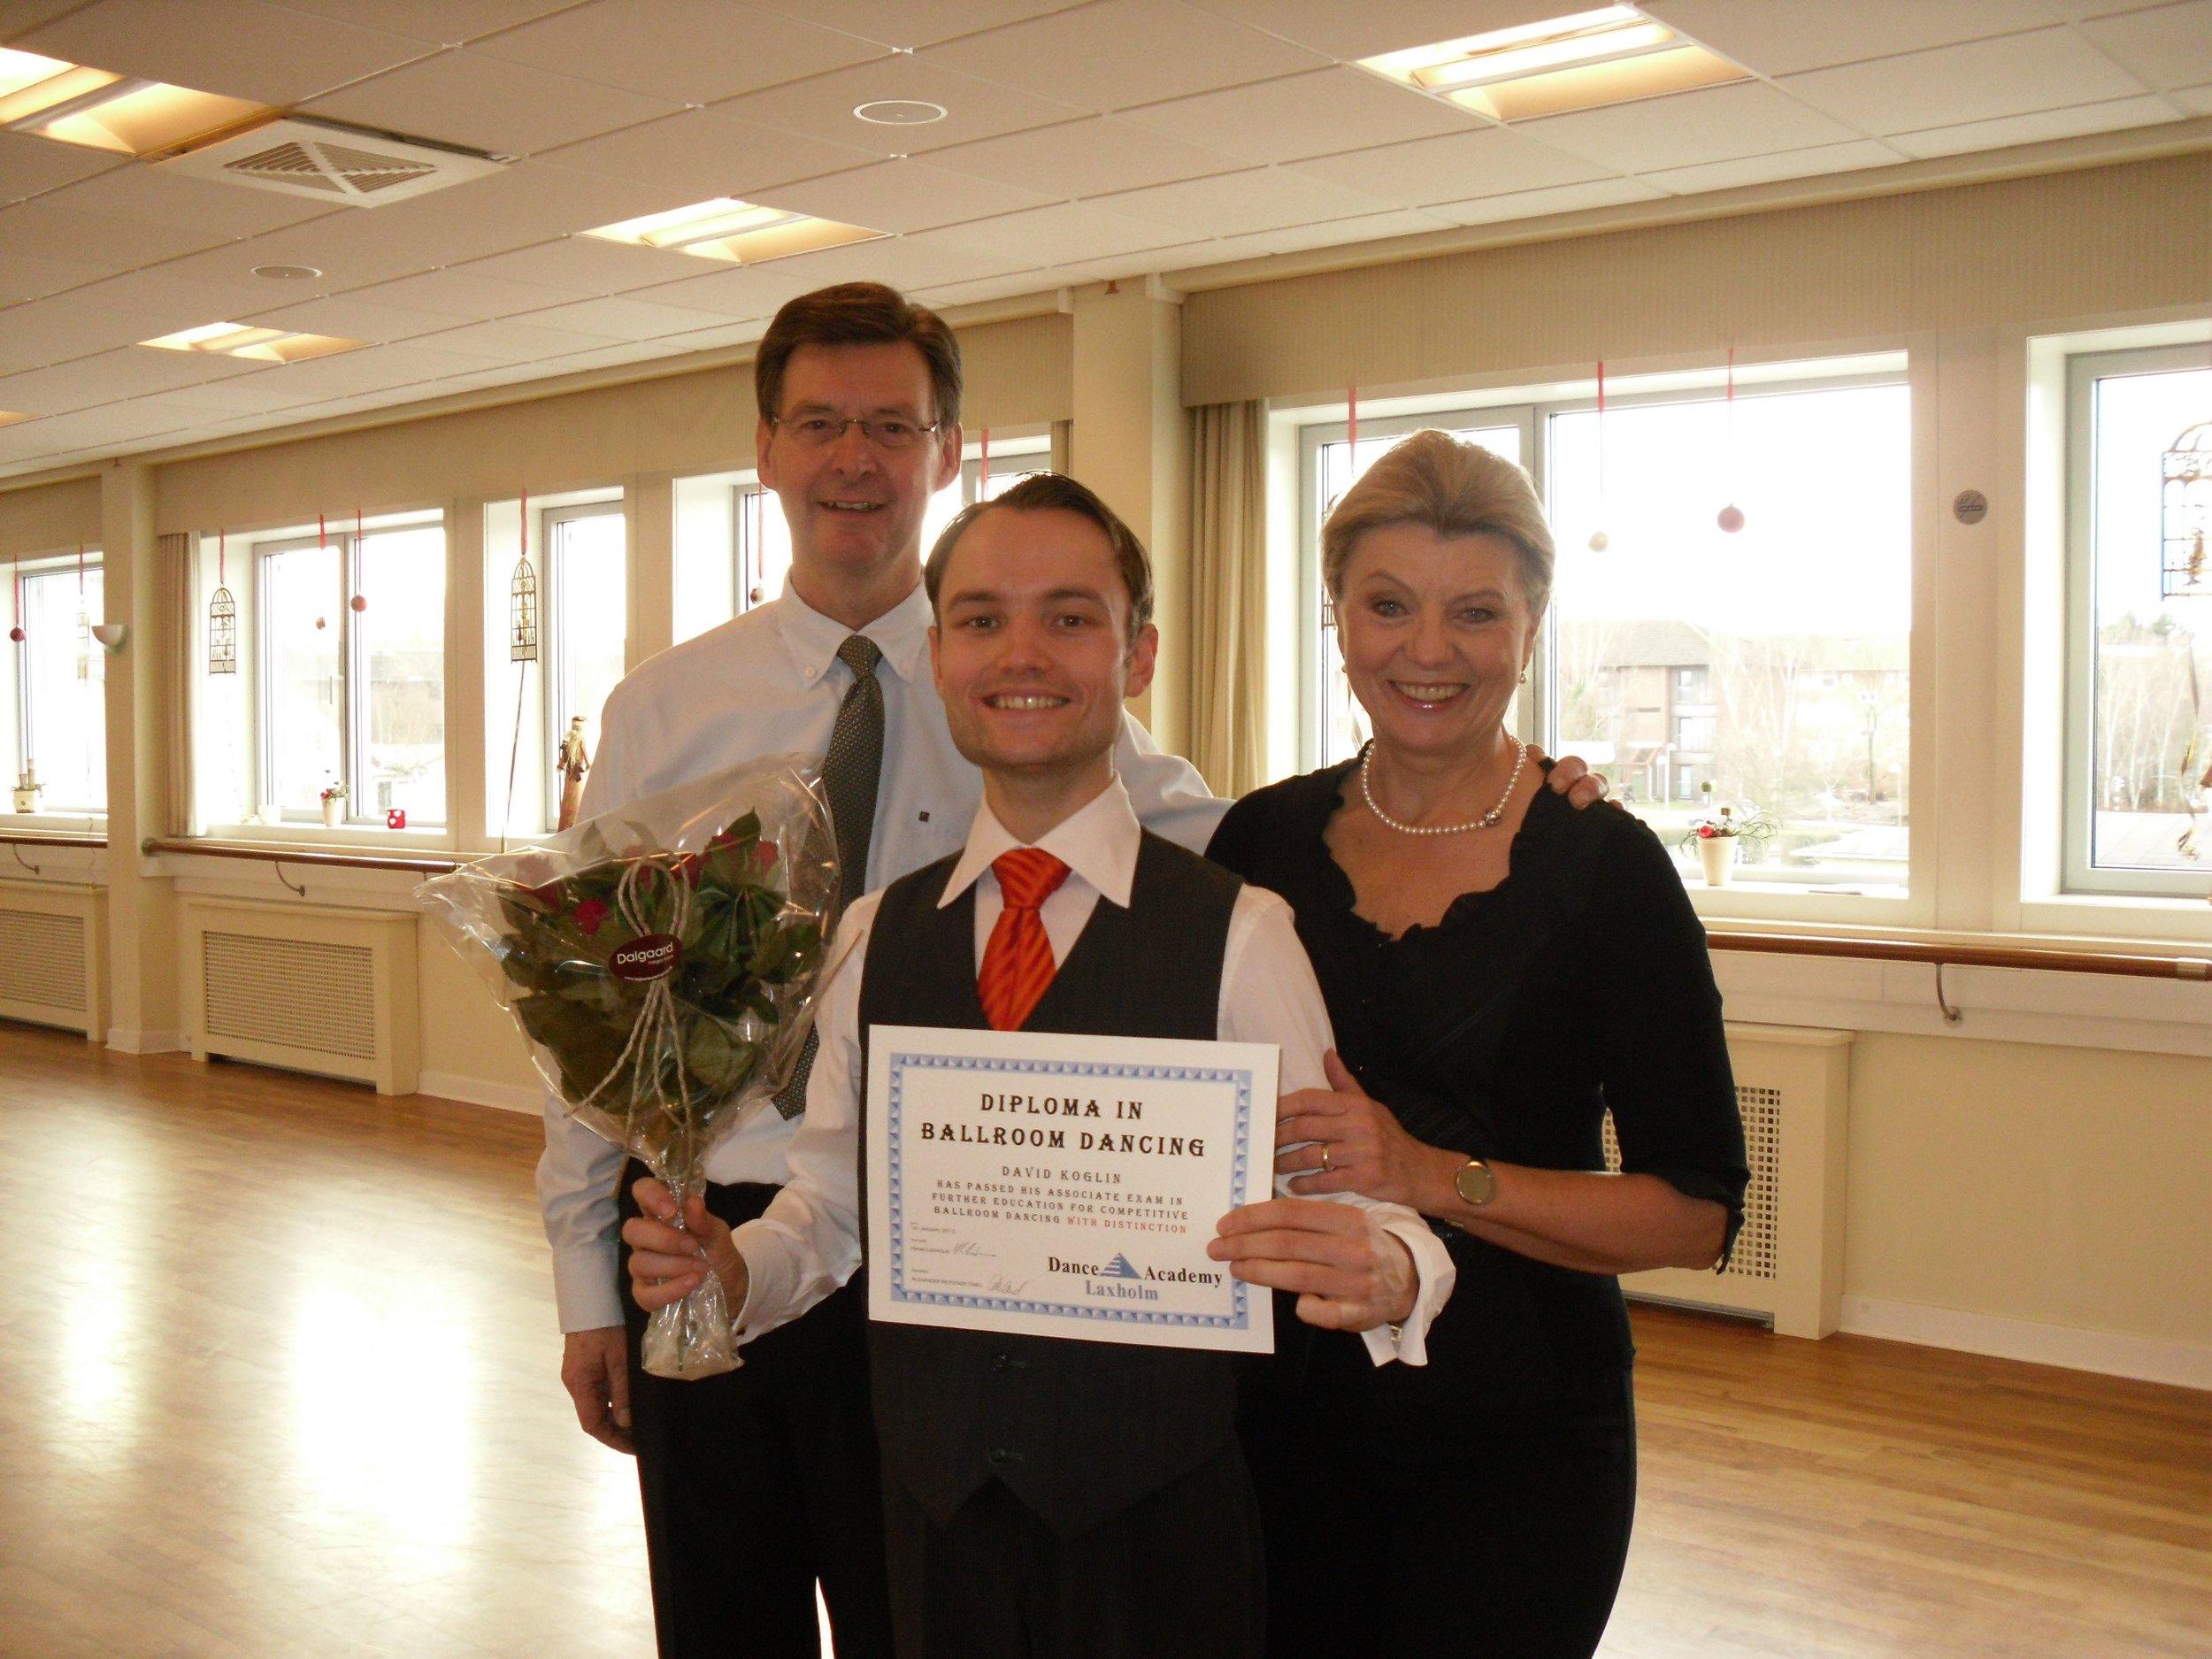 David Koglin receiving his Diploma in Ballroom Dancing at Dance Academy Laxholm